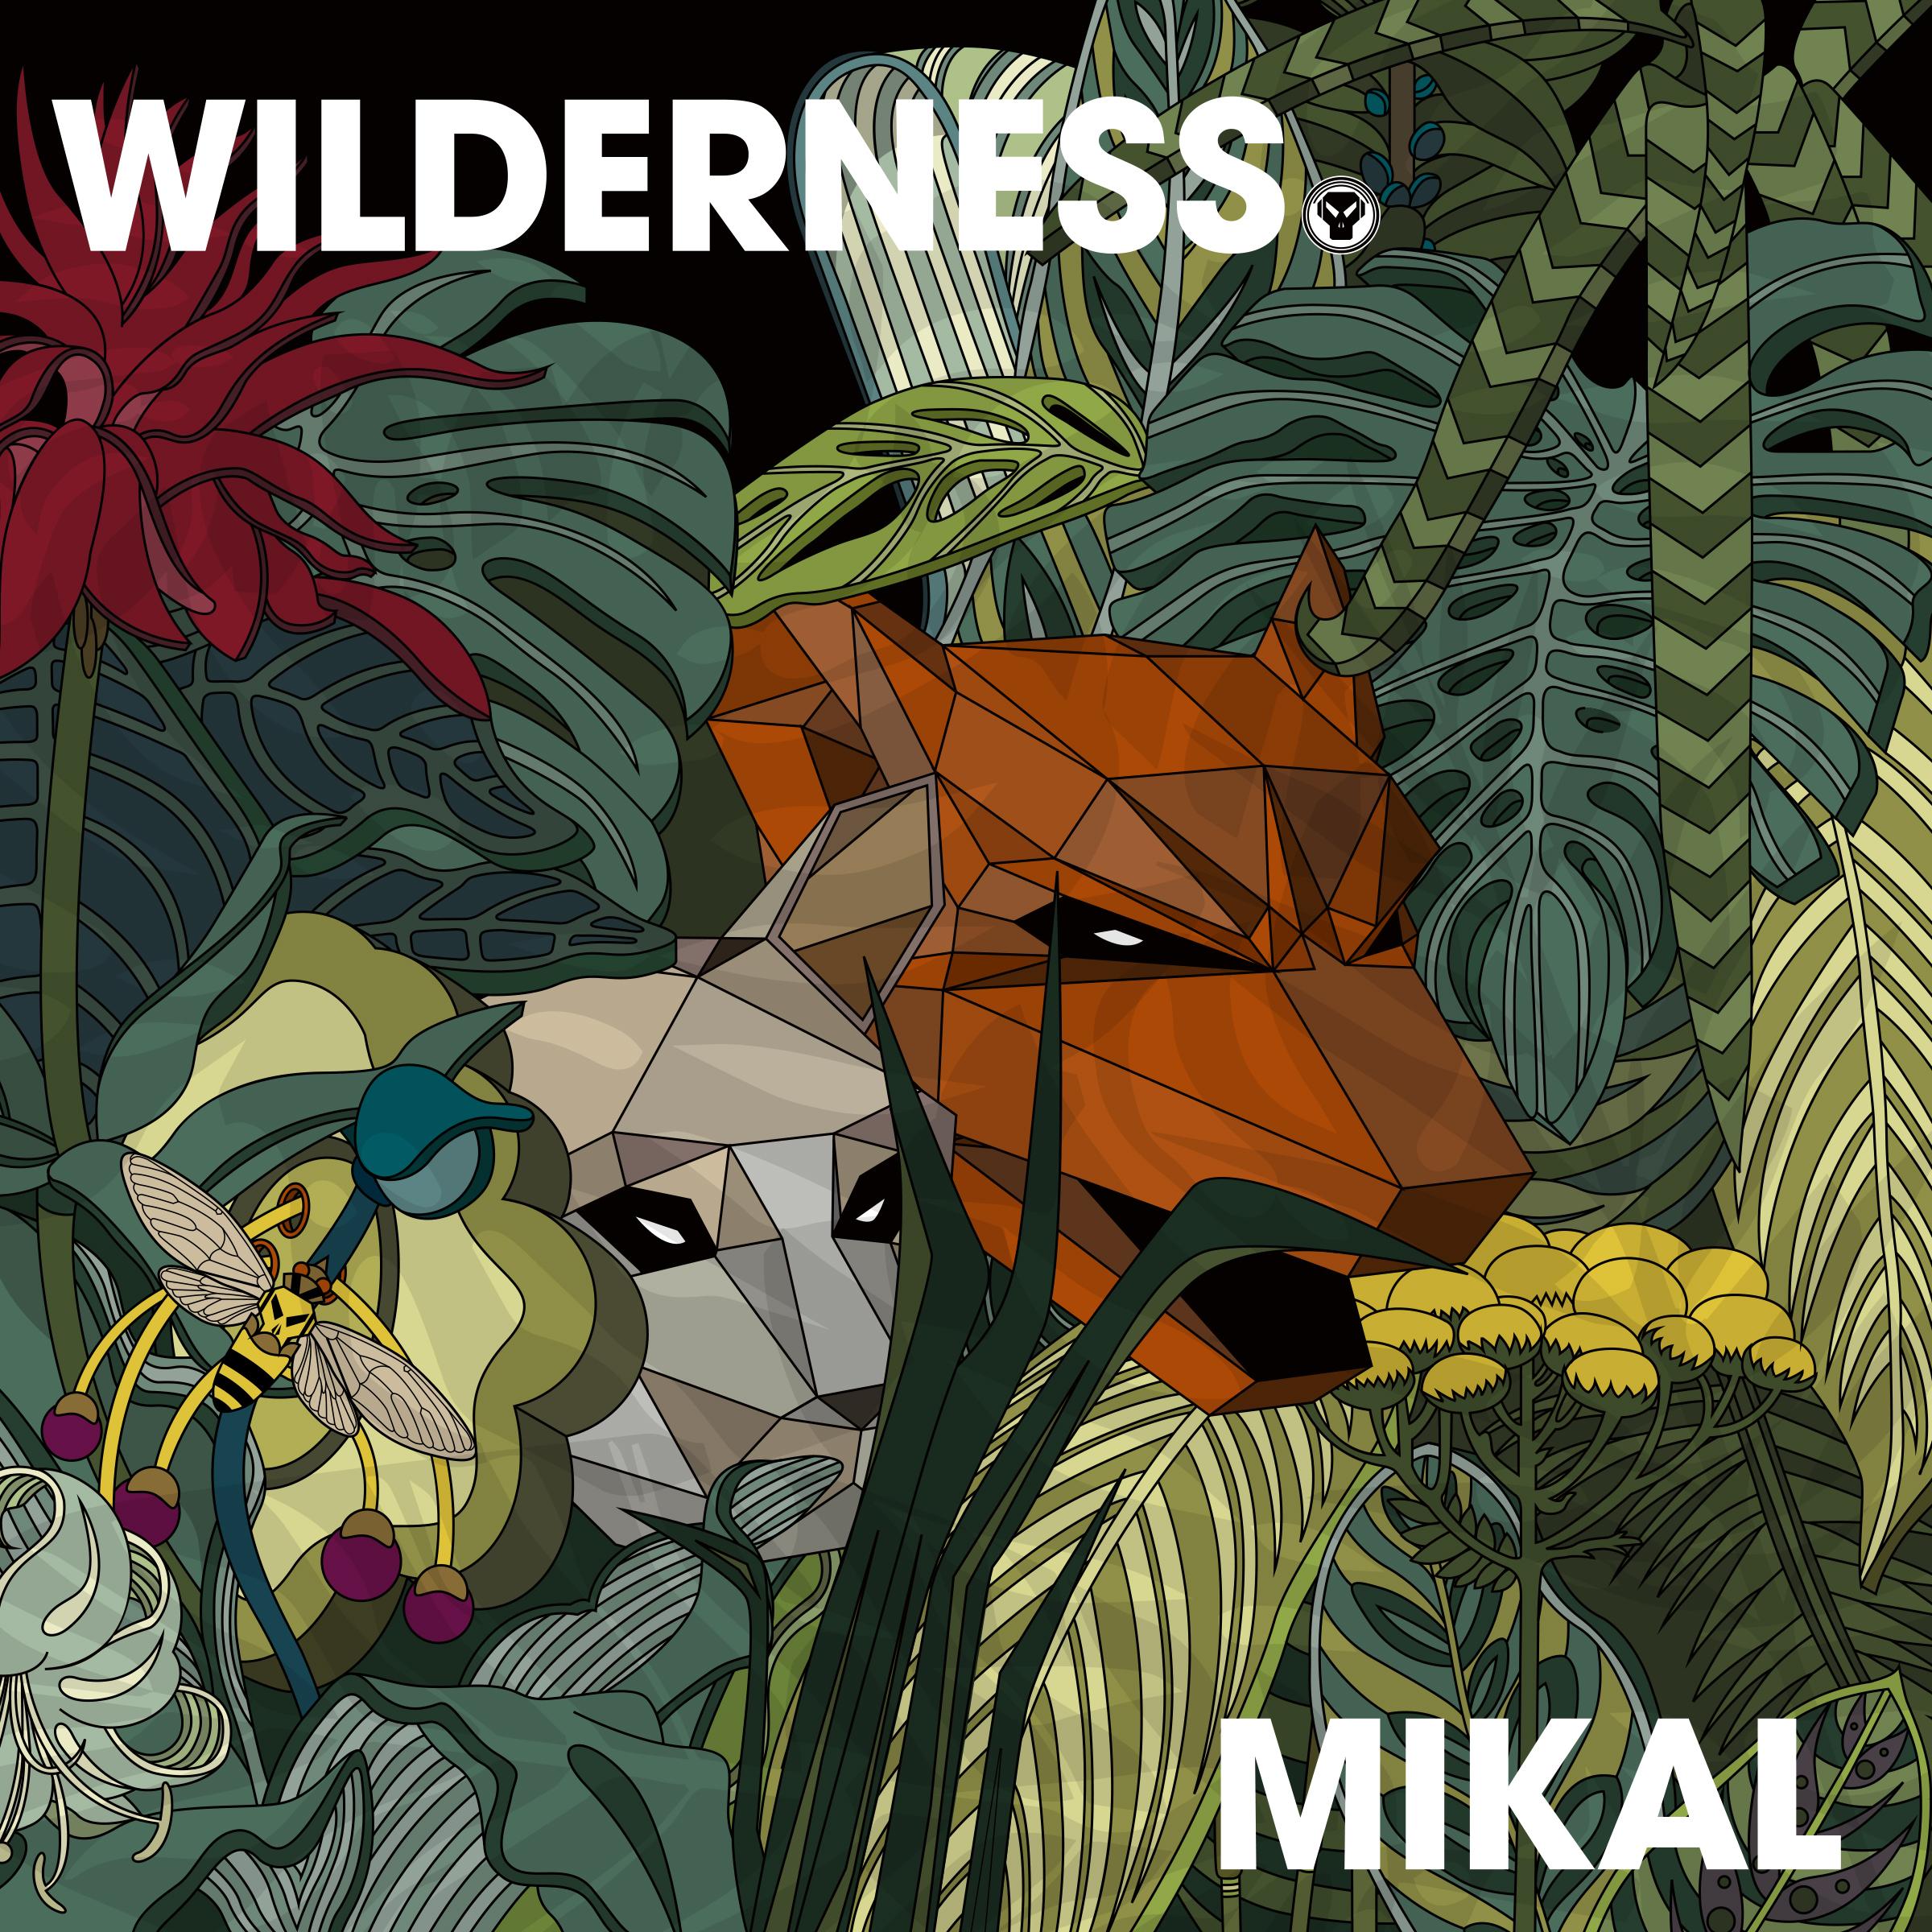 Mikal/WILDERNESS CD